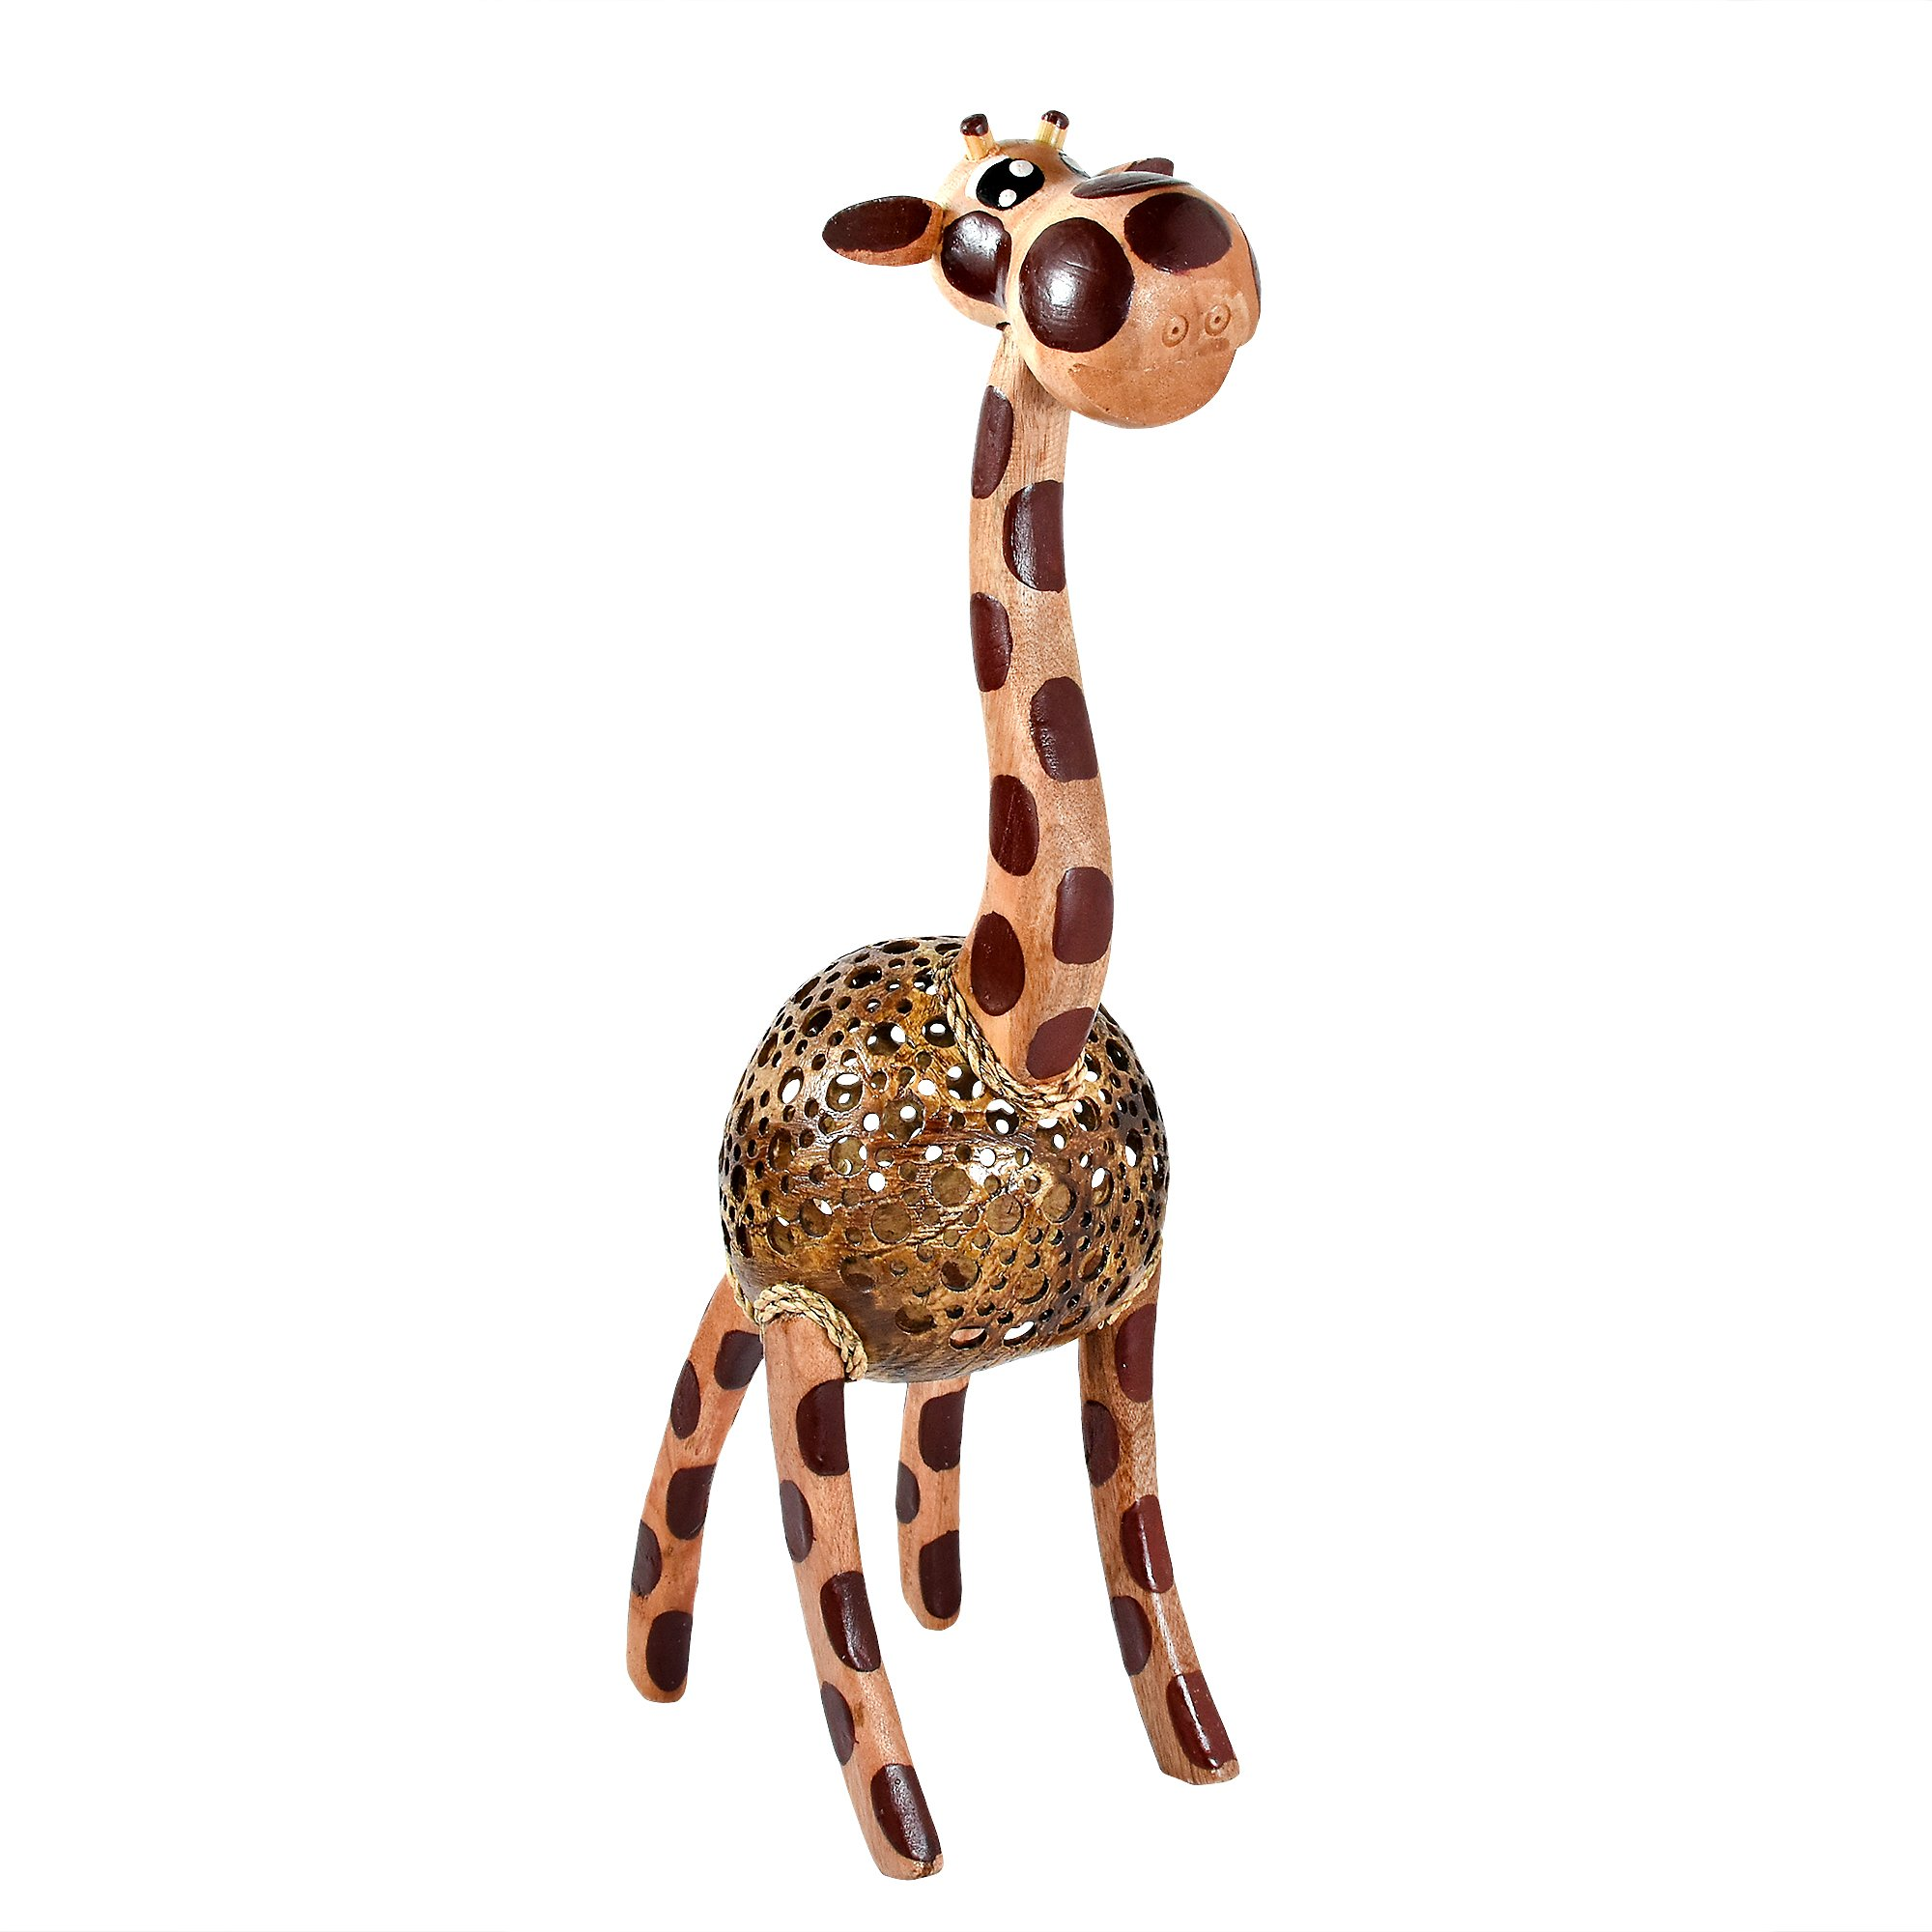 AeraVida Wooden Giraffe Coconut Shell Handmade Figurine Sculpture